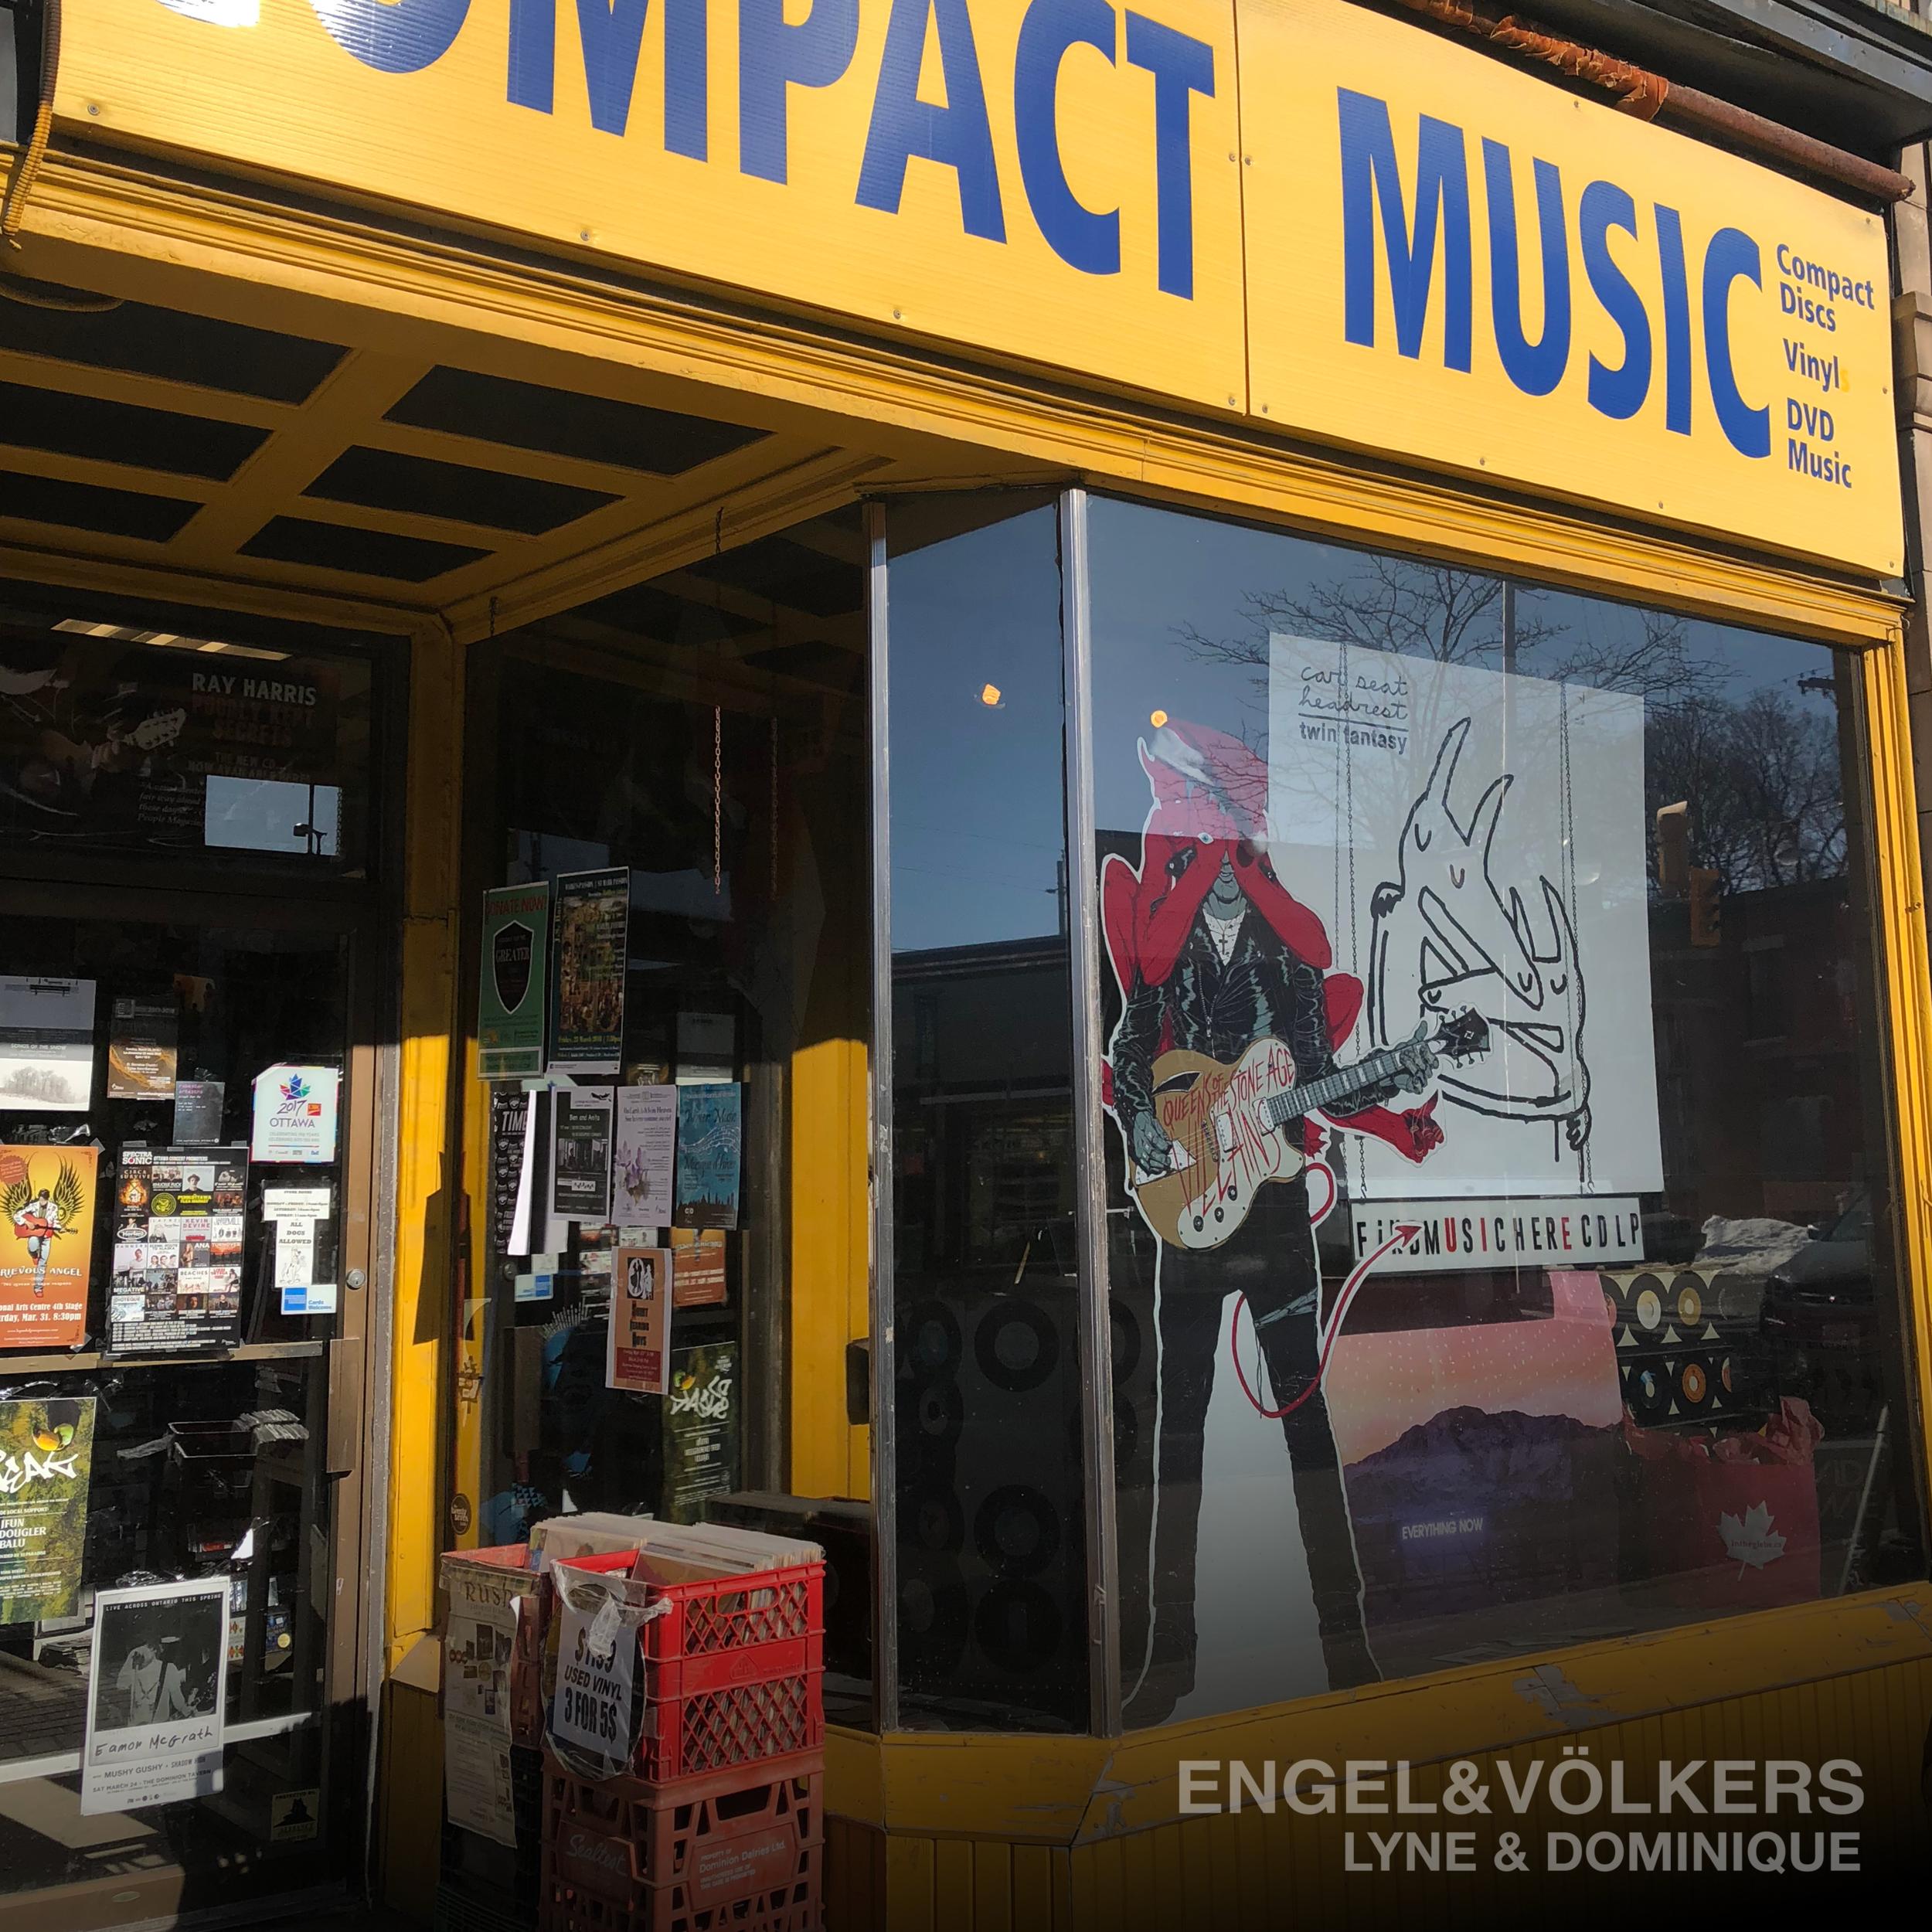 Lyne_And_Dominique_TheGlebe_Ottawa_compact_Music_Recordstore_16.png